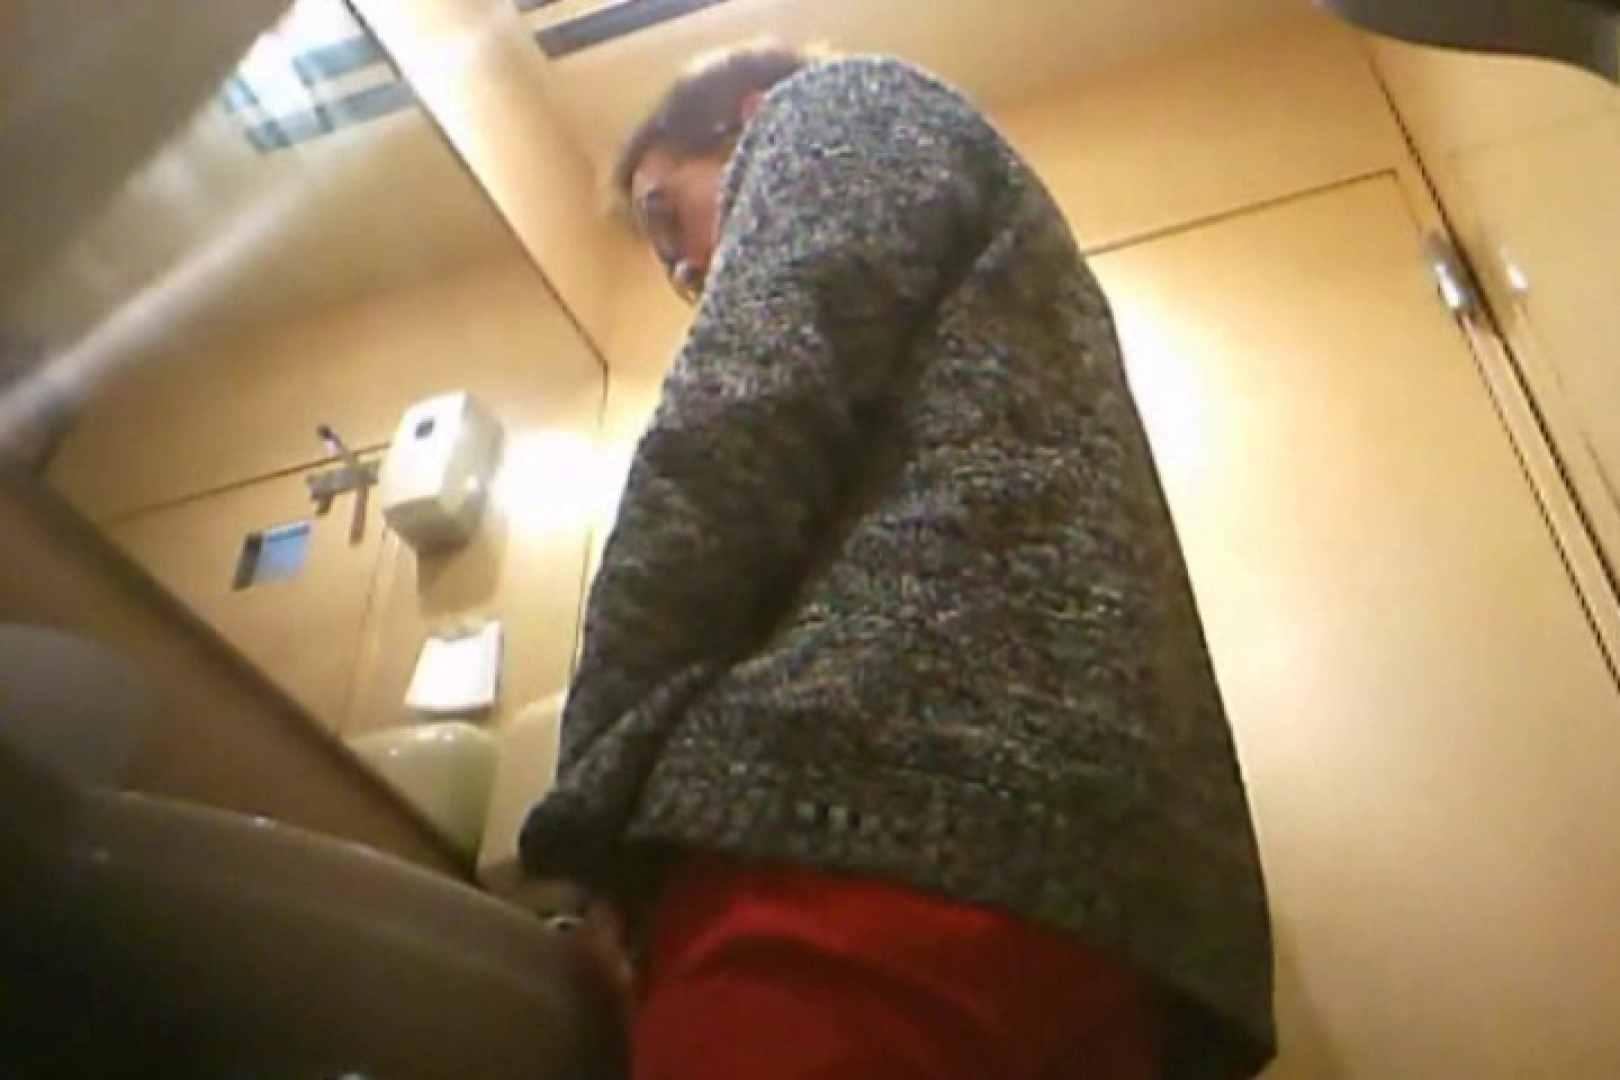 SEASON 3rd!掴み取りさんの洗面所覗き!in新幹線!VOL.21 リーマン系な男たち 男同士動画 108連発 86